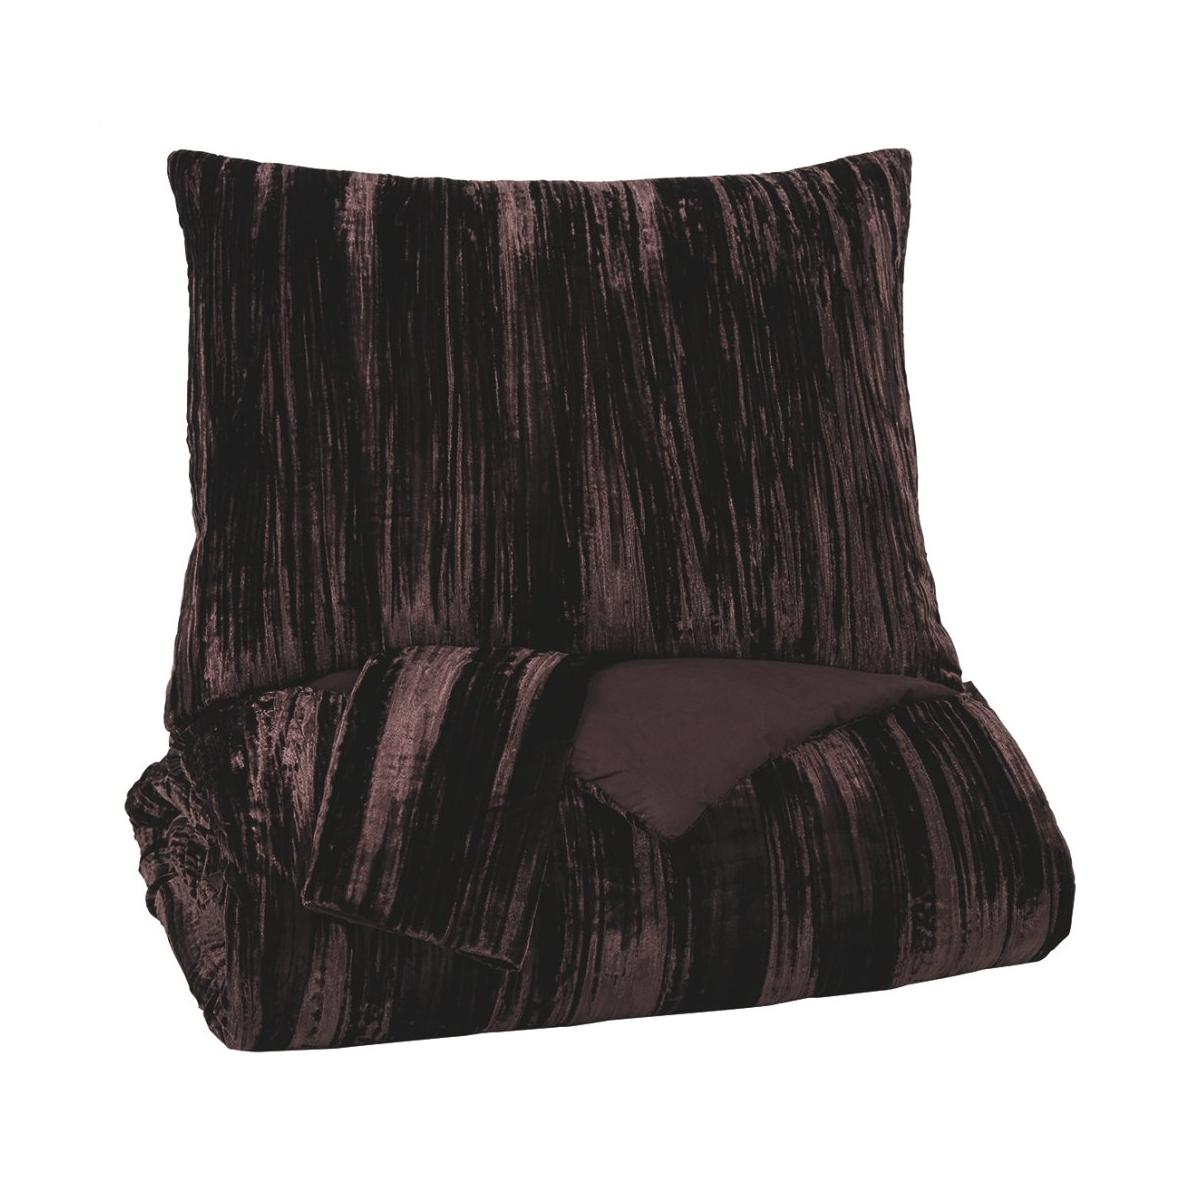 See Details - Wanete 3-piece King Comforter Set